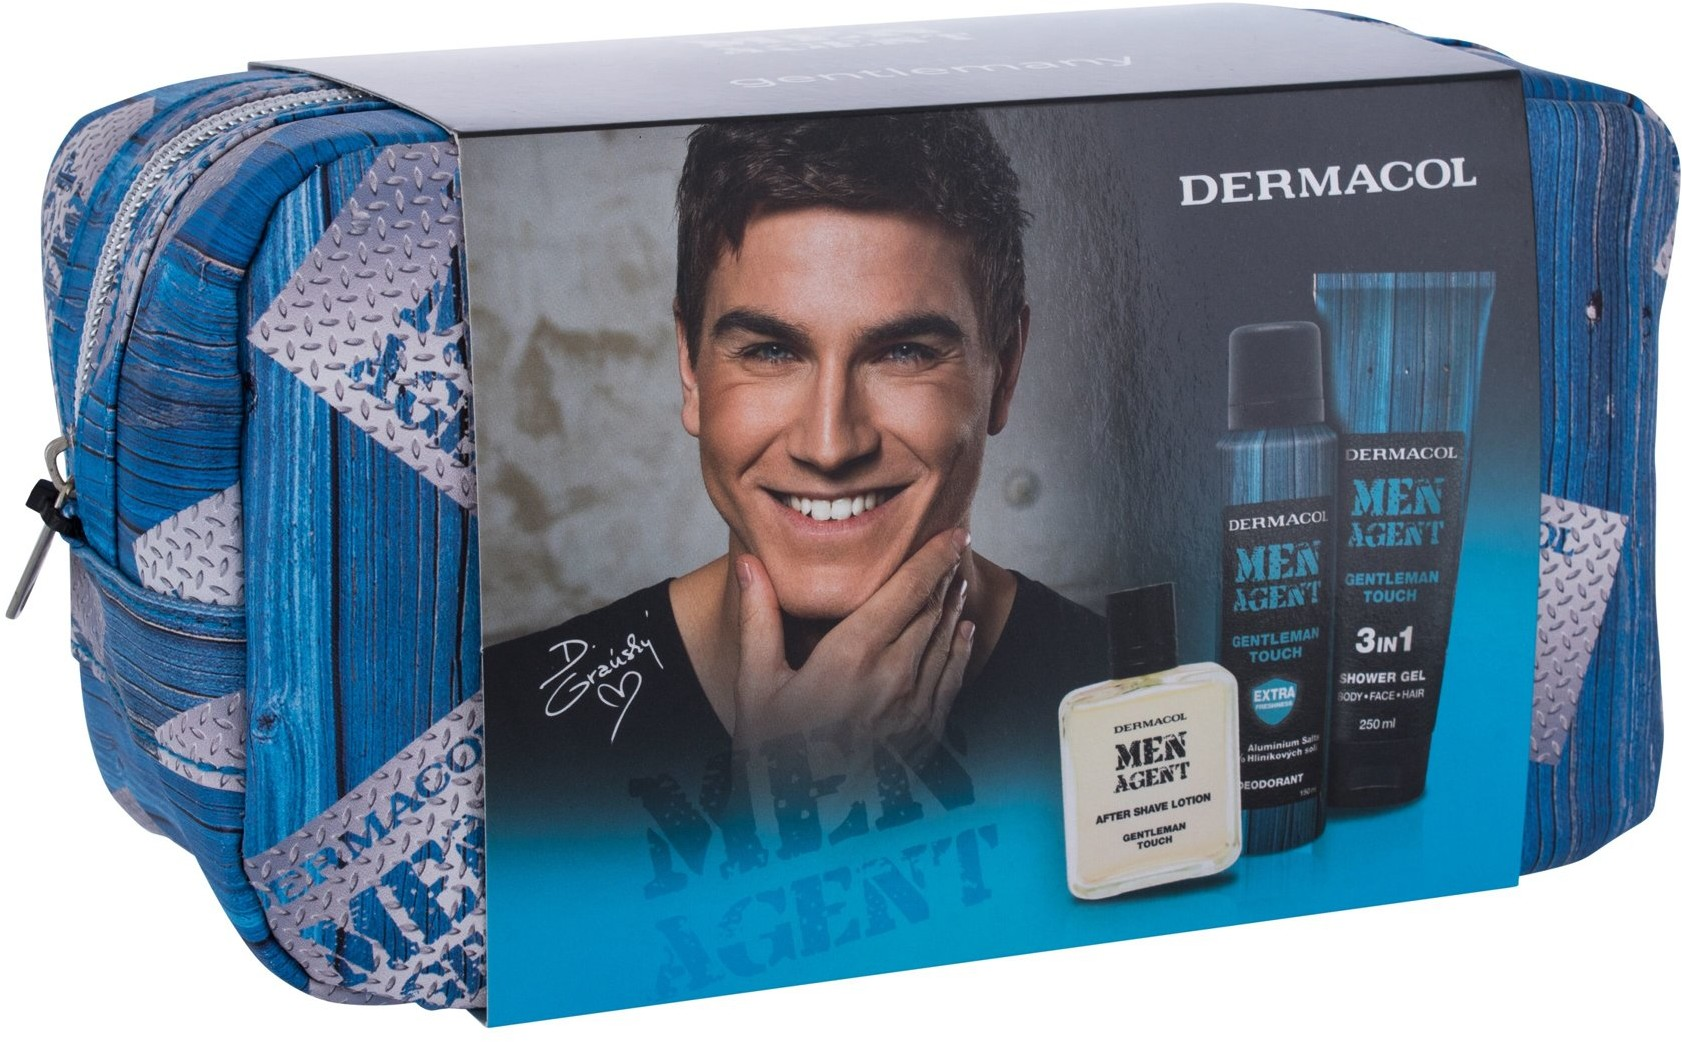 Dermacol Men Agent 3in1 Gentleman Touch 250 ml Żel pod prysznic